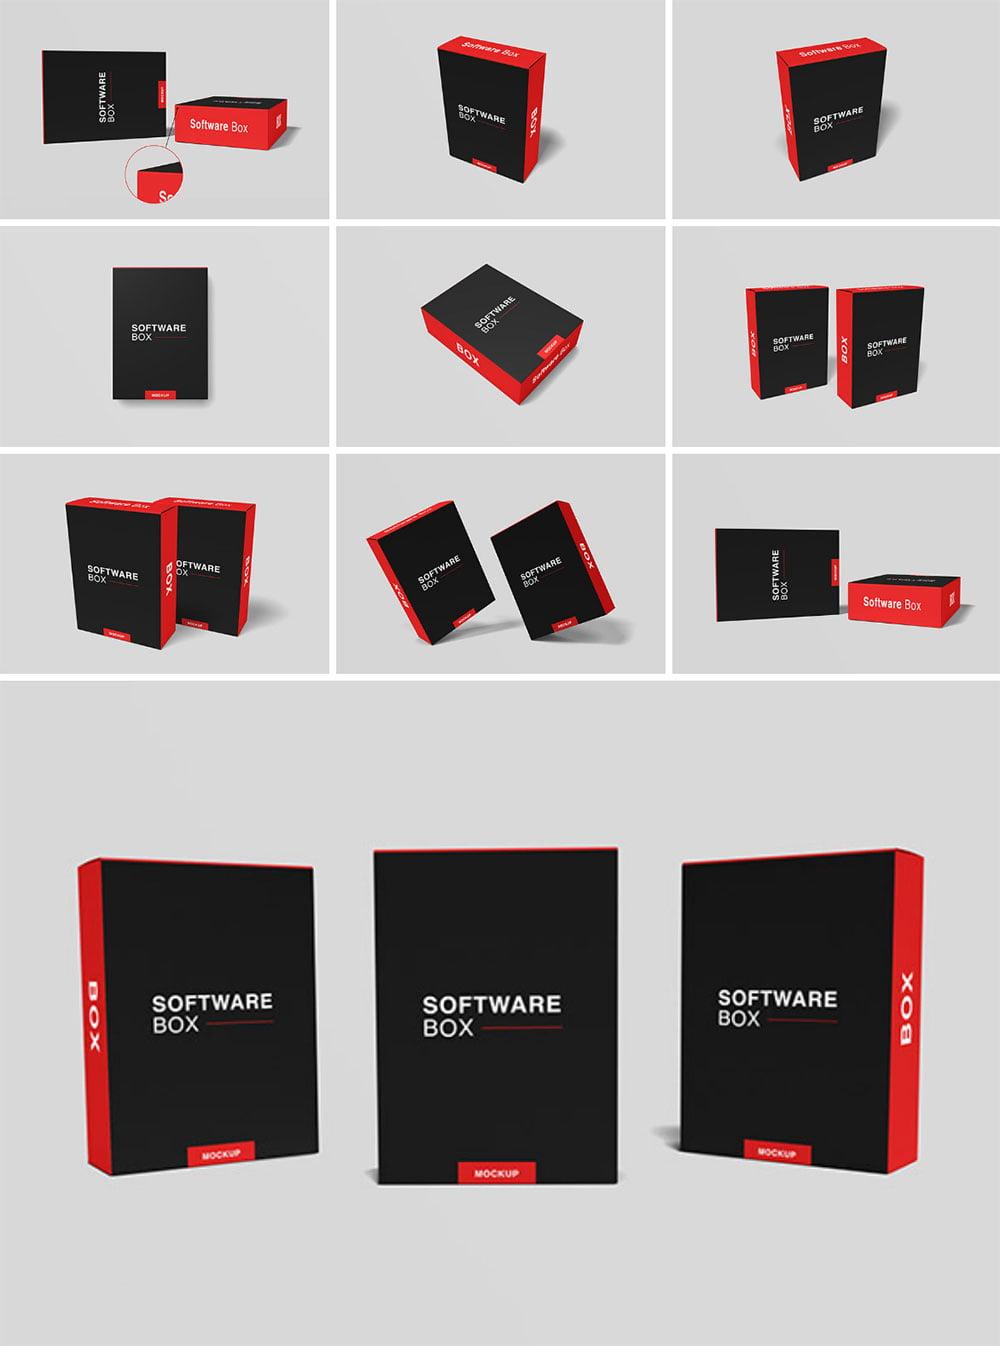 Download Free Realistic Software Box Mockup | Mockuptree